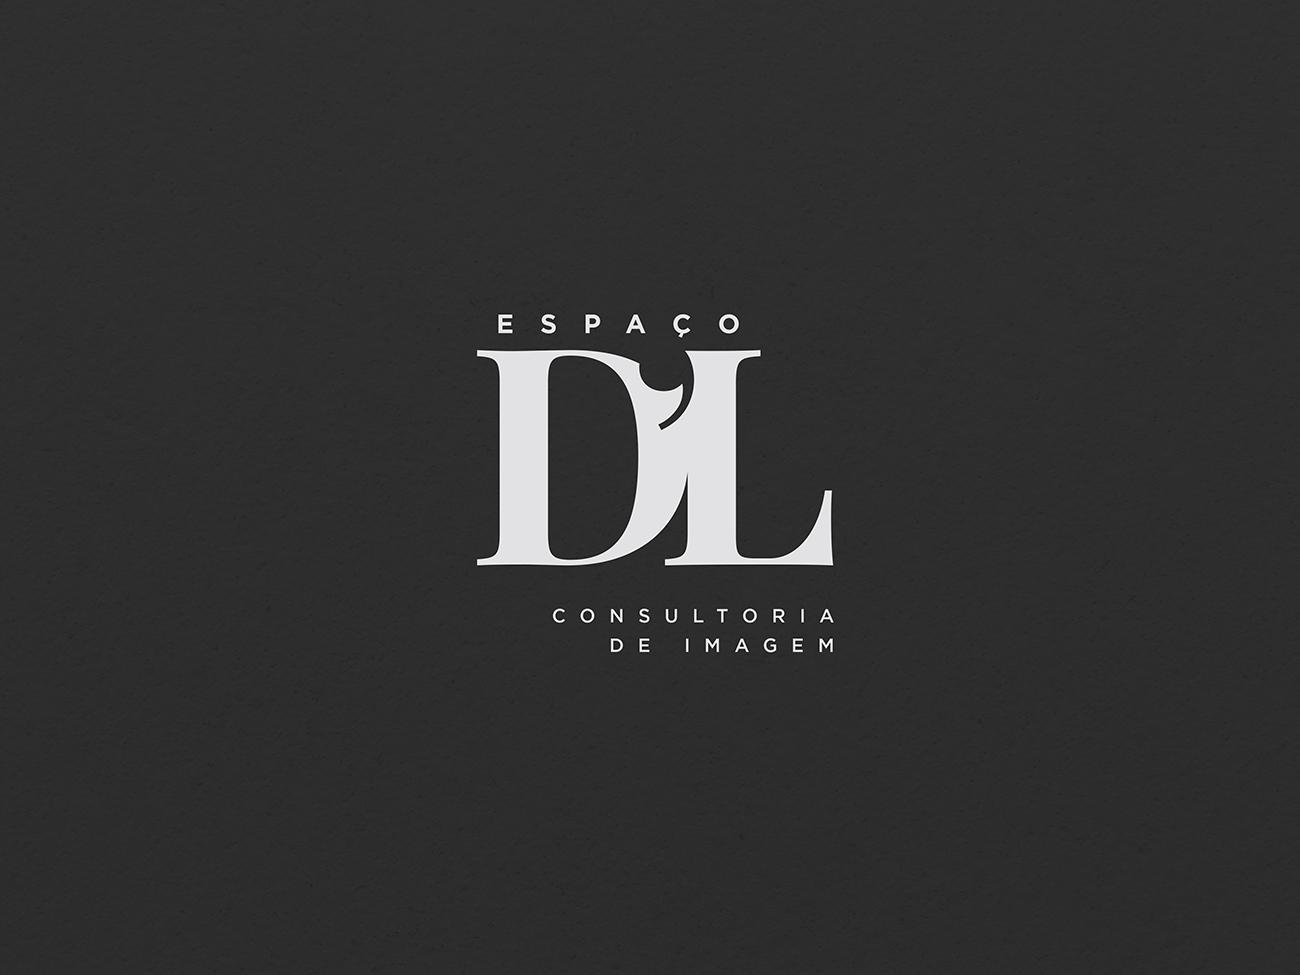 logotipo consultoria de imagem